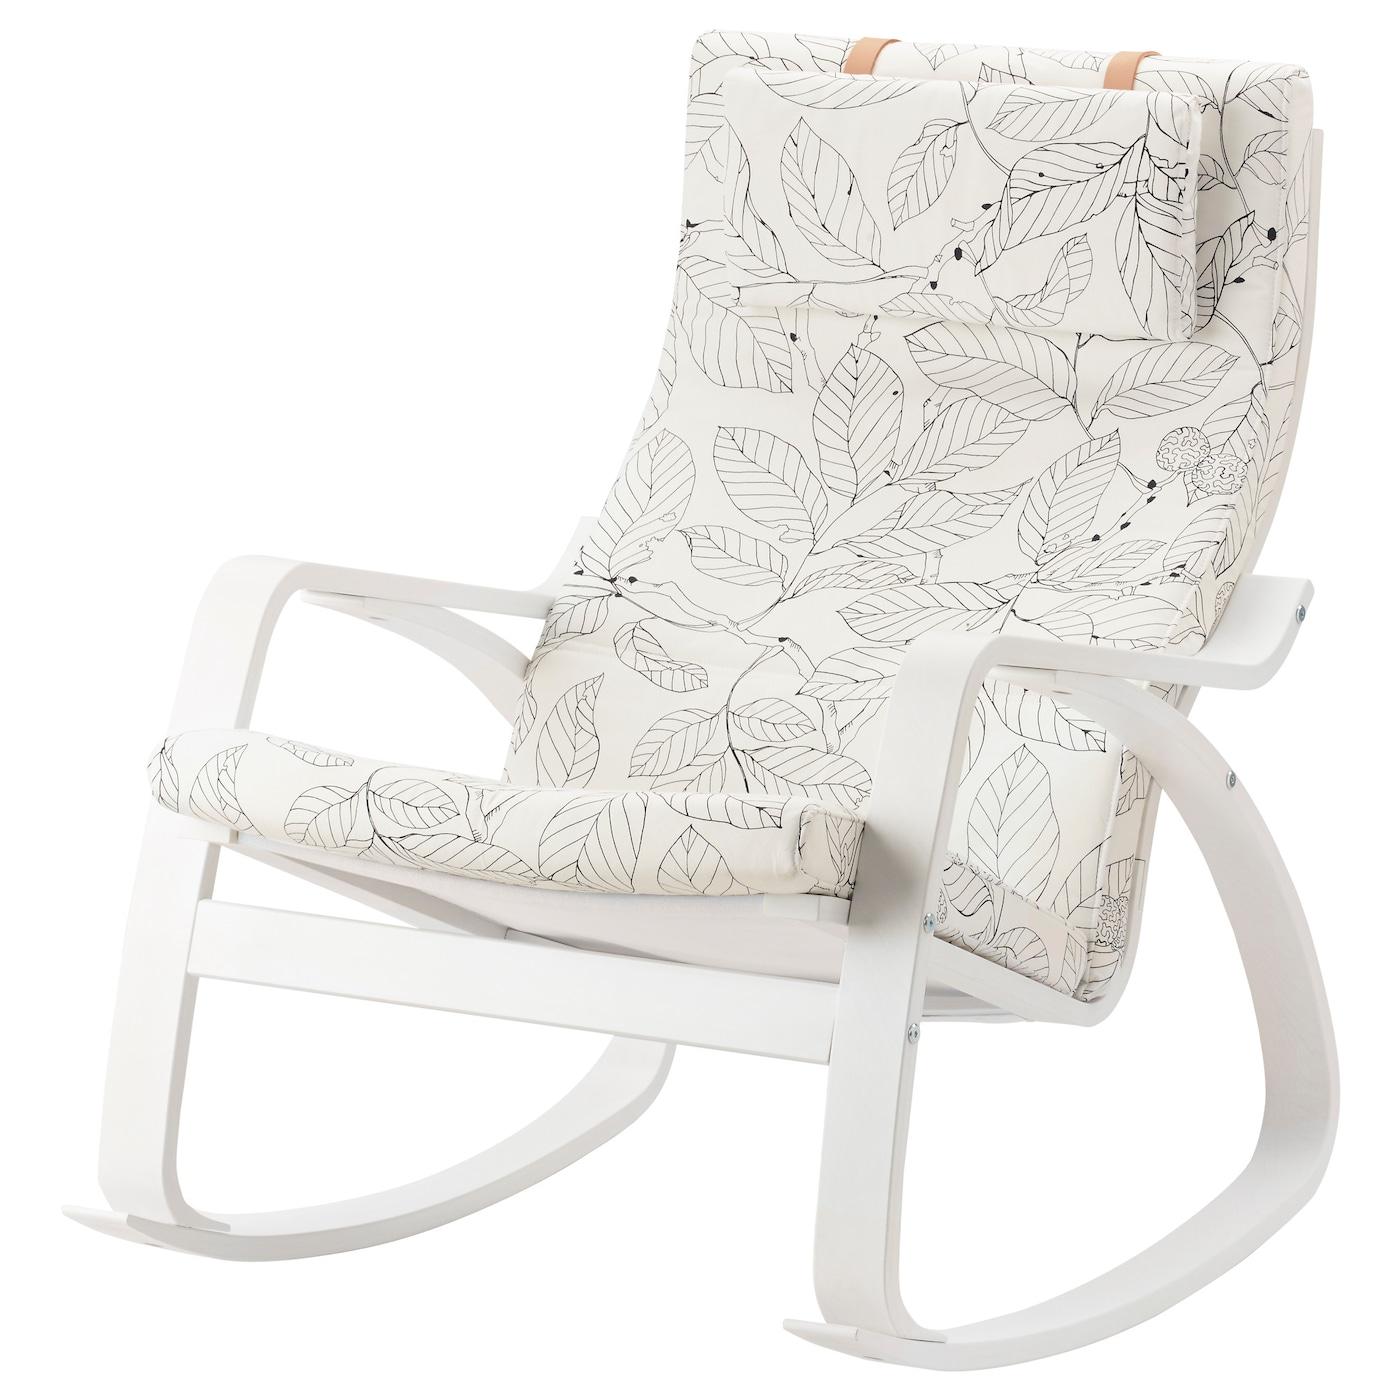 schaukelsessel online kaufen m bel suchmaschine. Black Bedroom Furniture Sets. Home Design Ideas